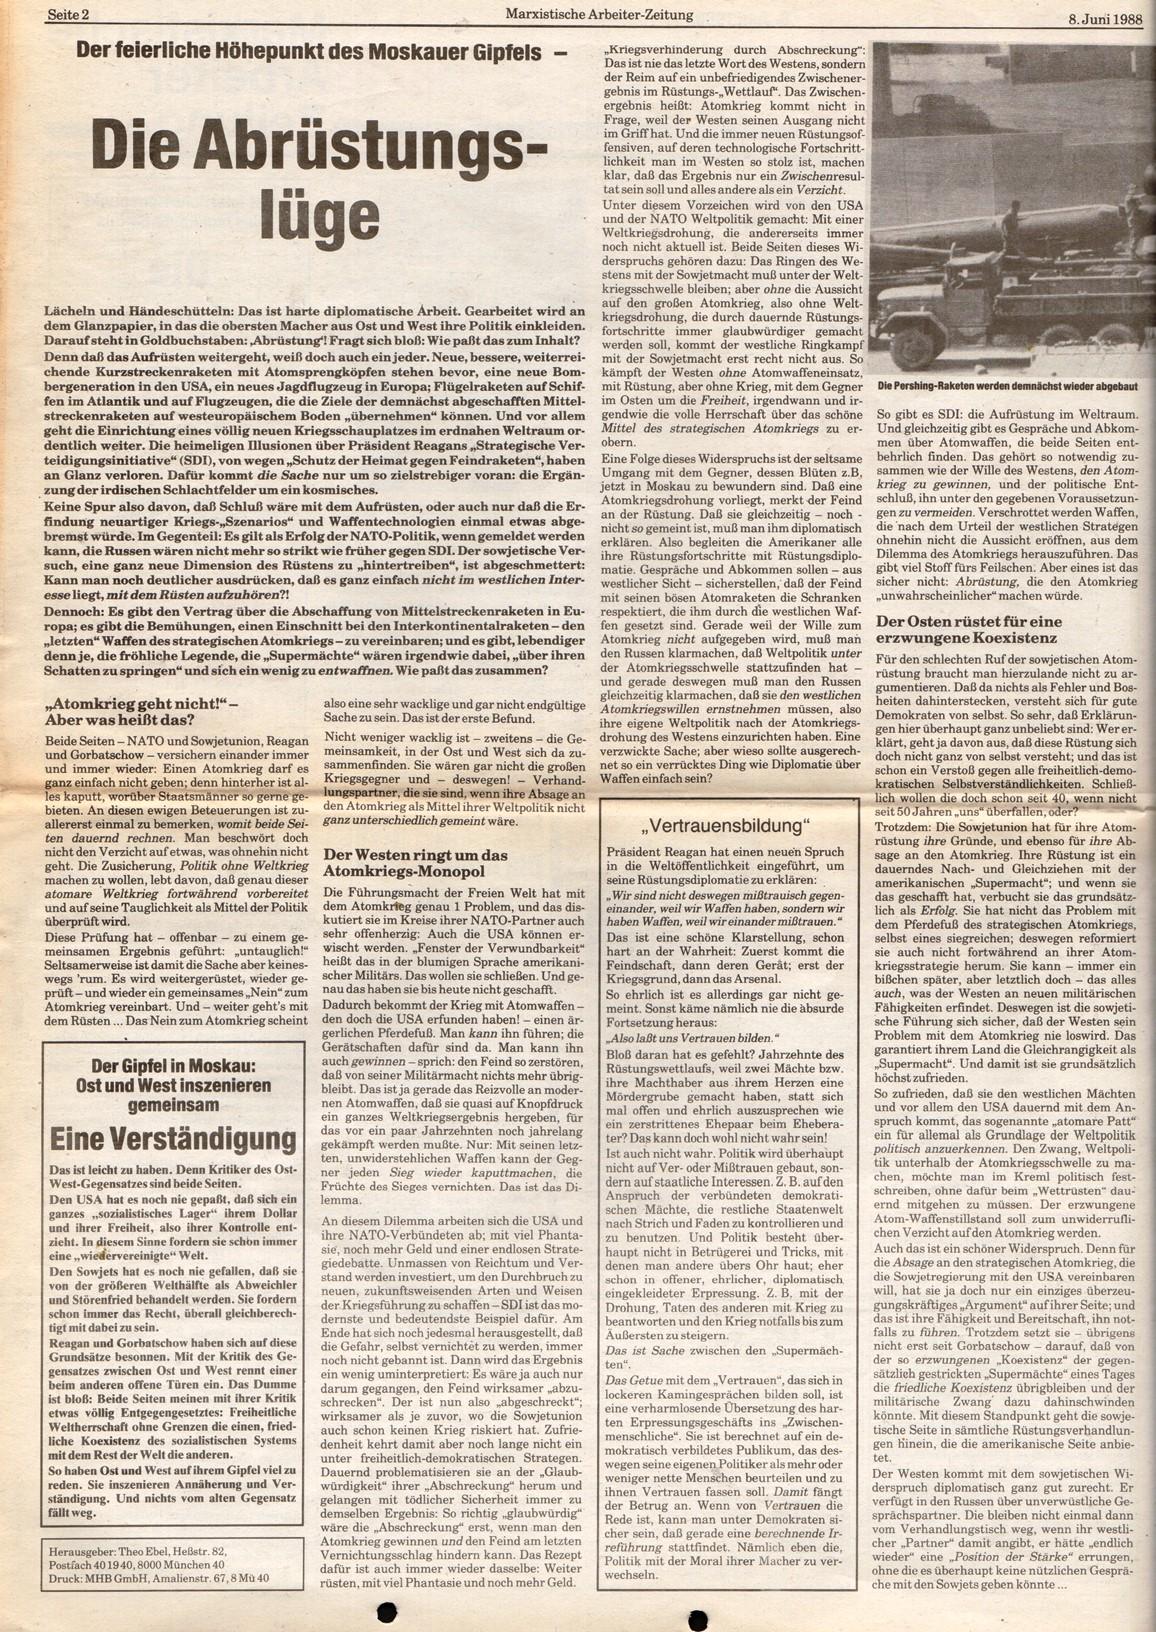 Muenchen_MG_MAZ_19880608_02